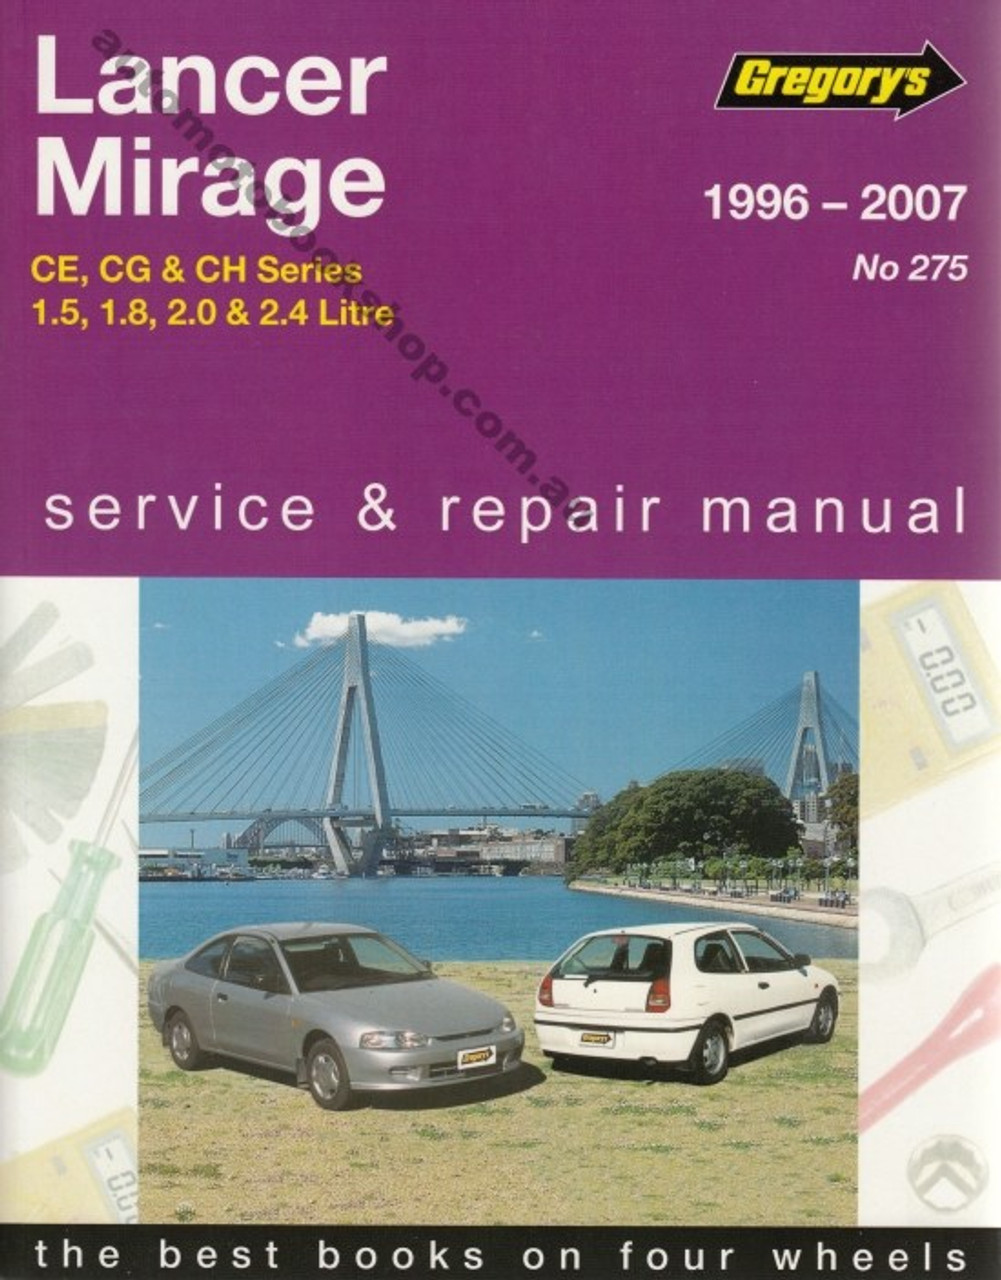 mitsubishi lancer mirage ce cg ch 1996 2007 workshop manual rh automotobookshop com au Mitsubishi Lancer 1.6 GLX Mitsubishi Lancer 1.6 GLX